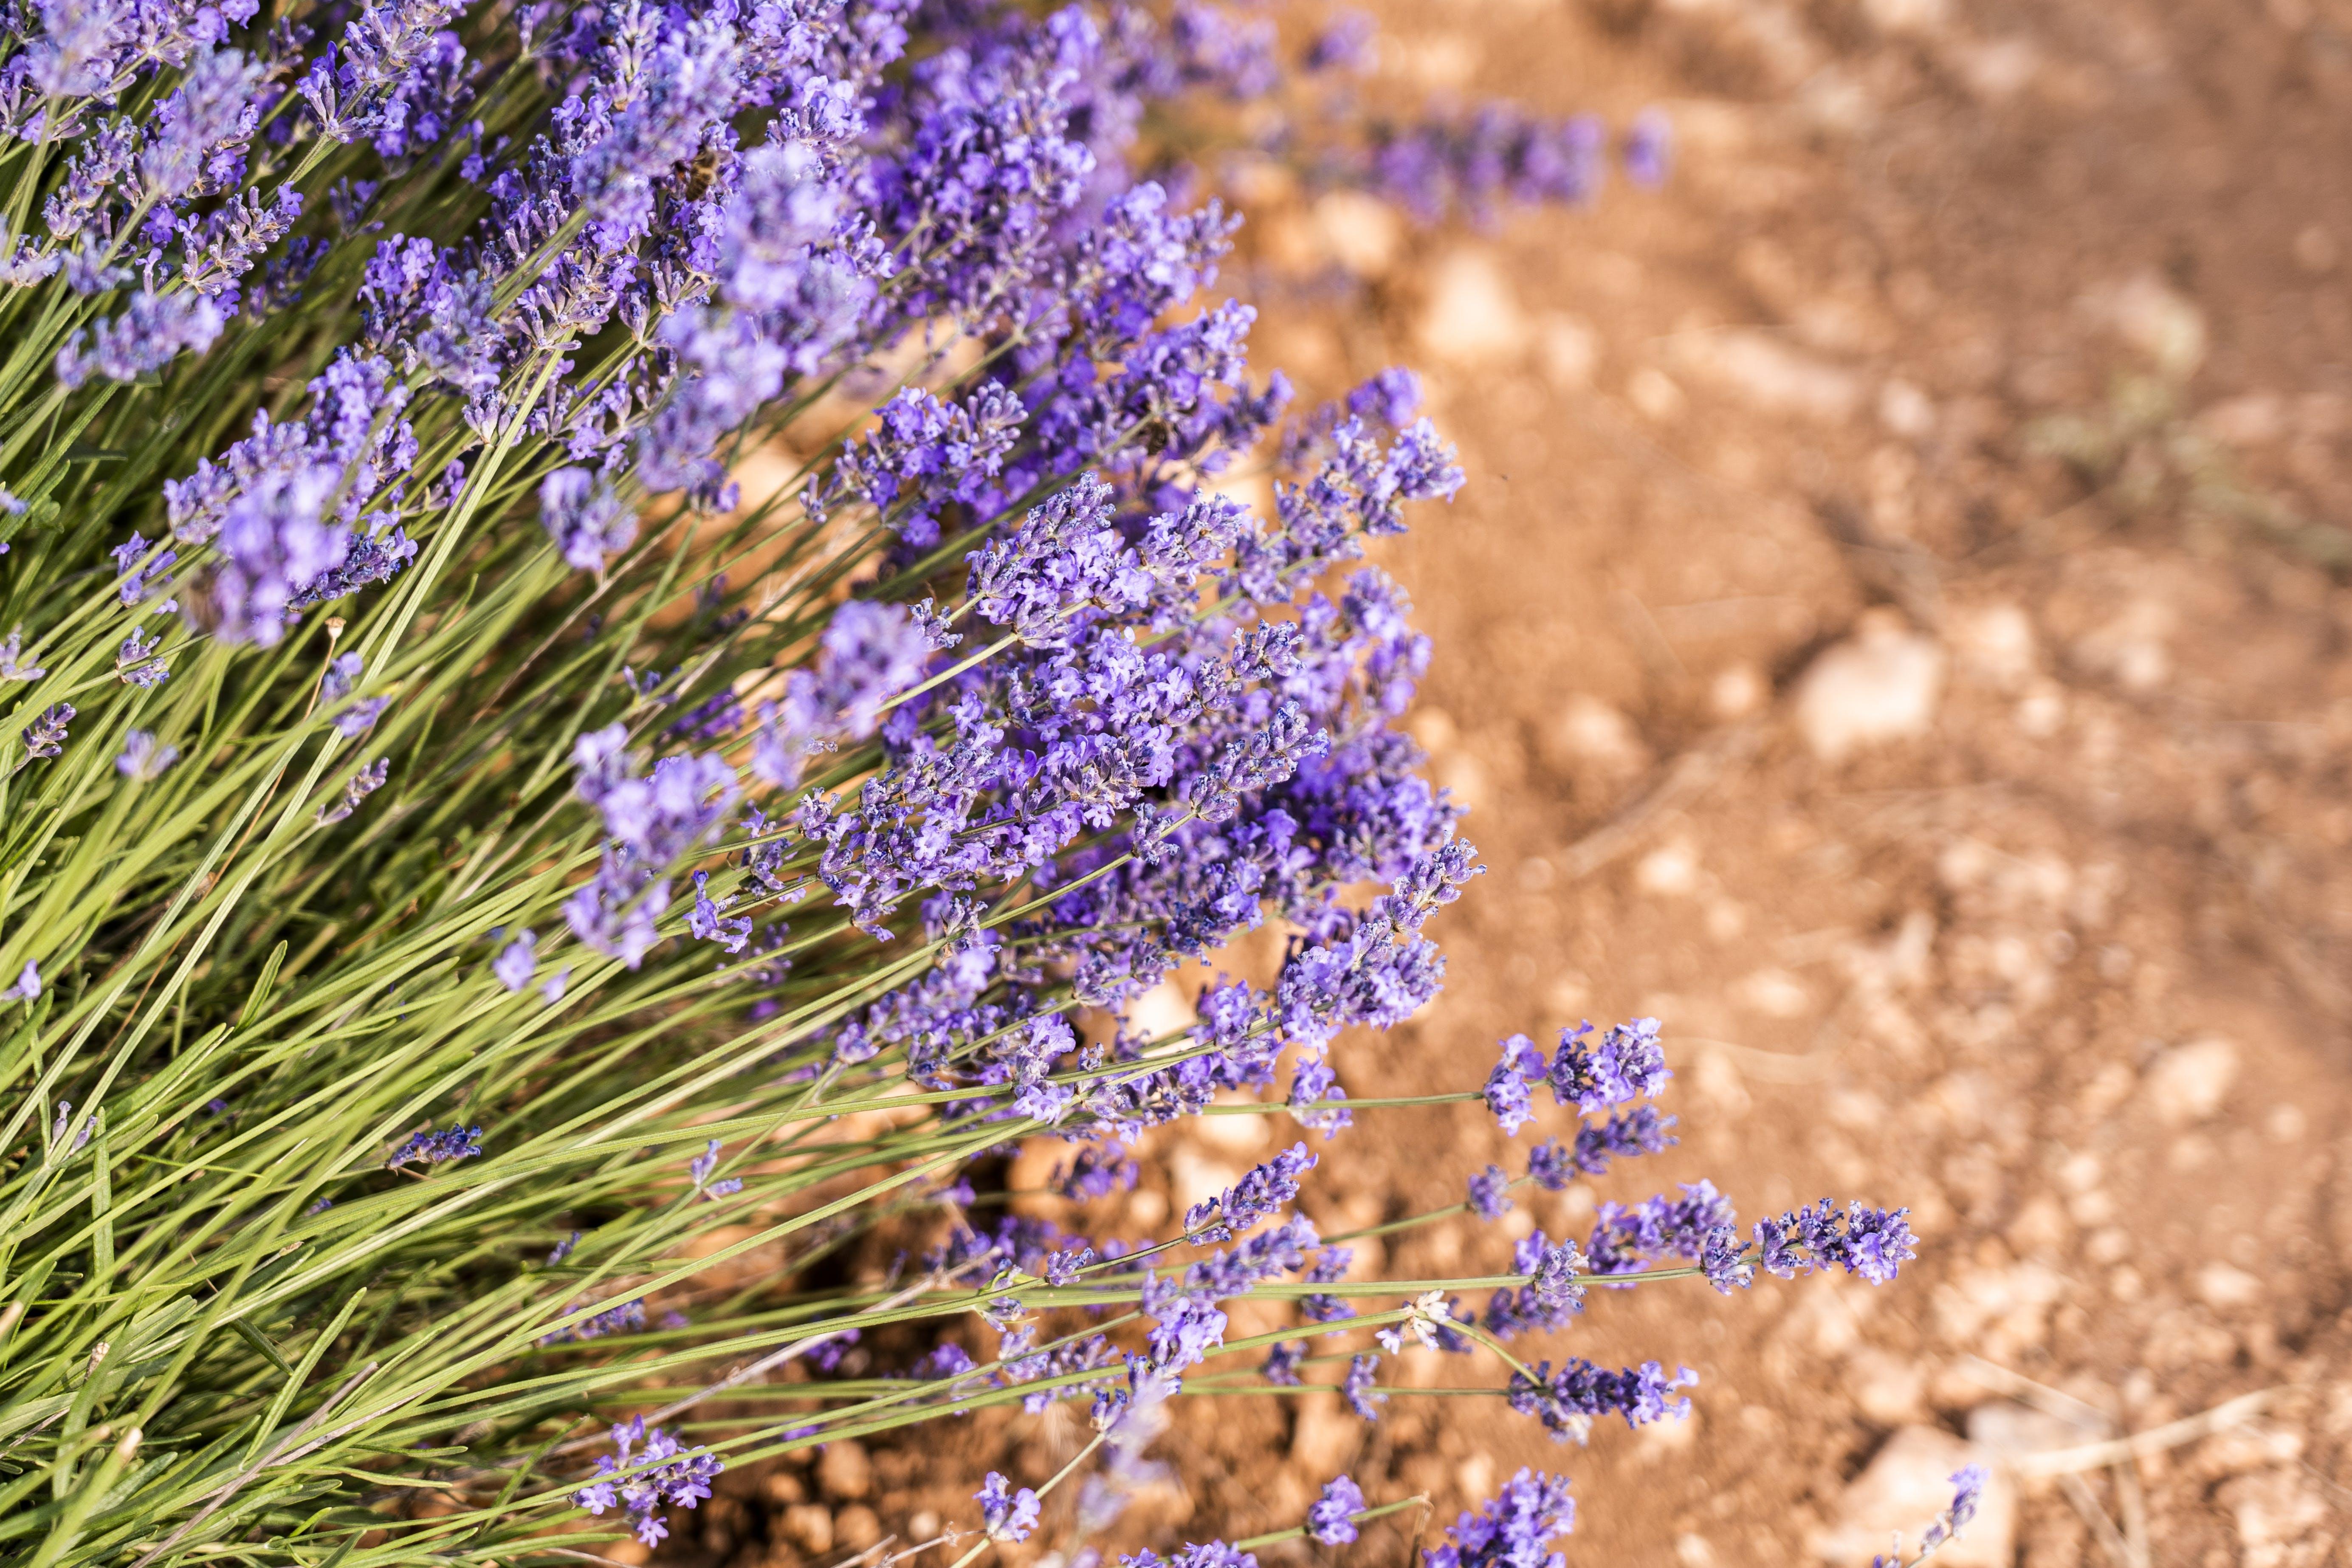 Cluster of Purple Flowers